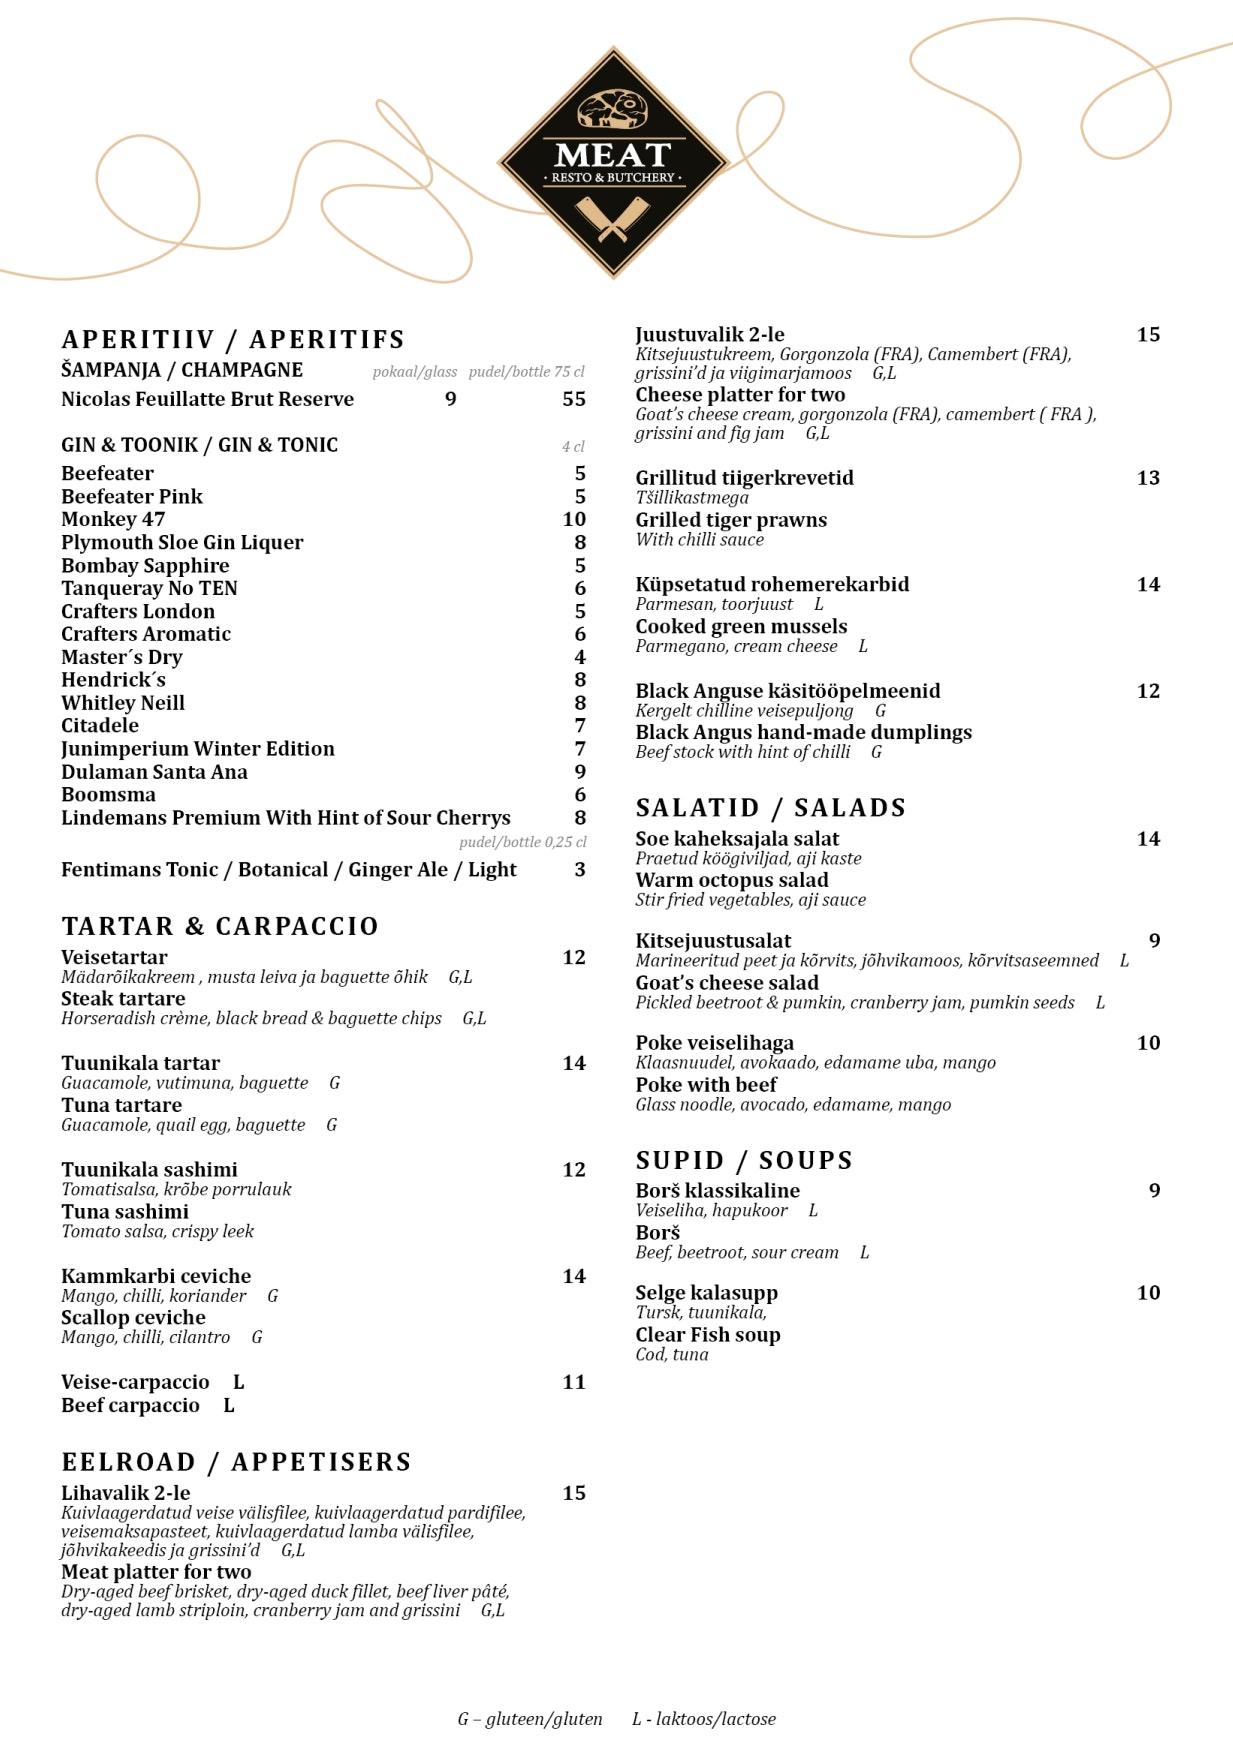 MEAT Resto & Butchery menu 3/5